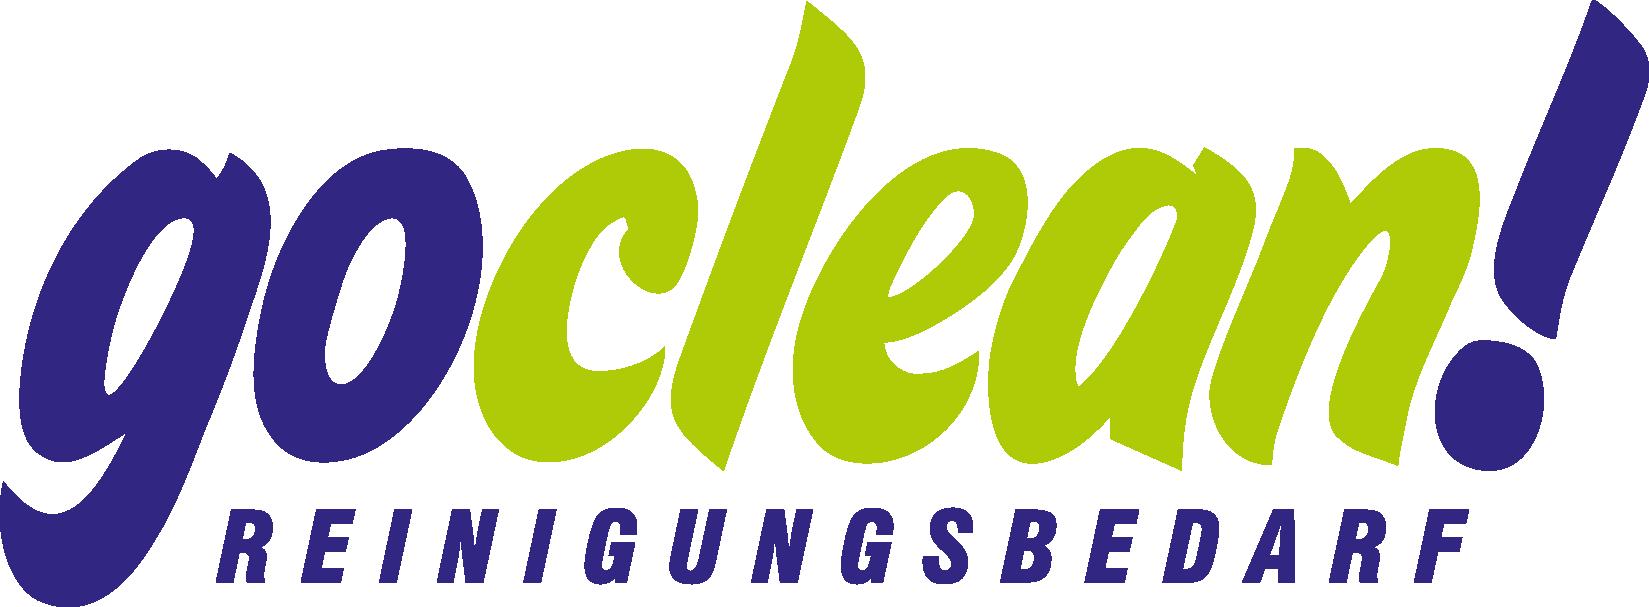 go clean! Shop